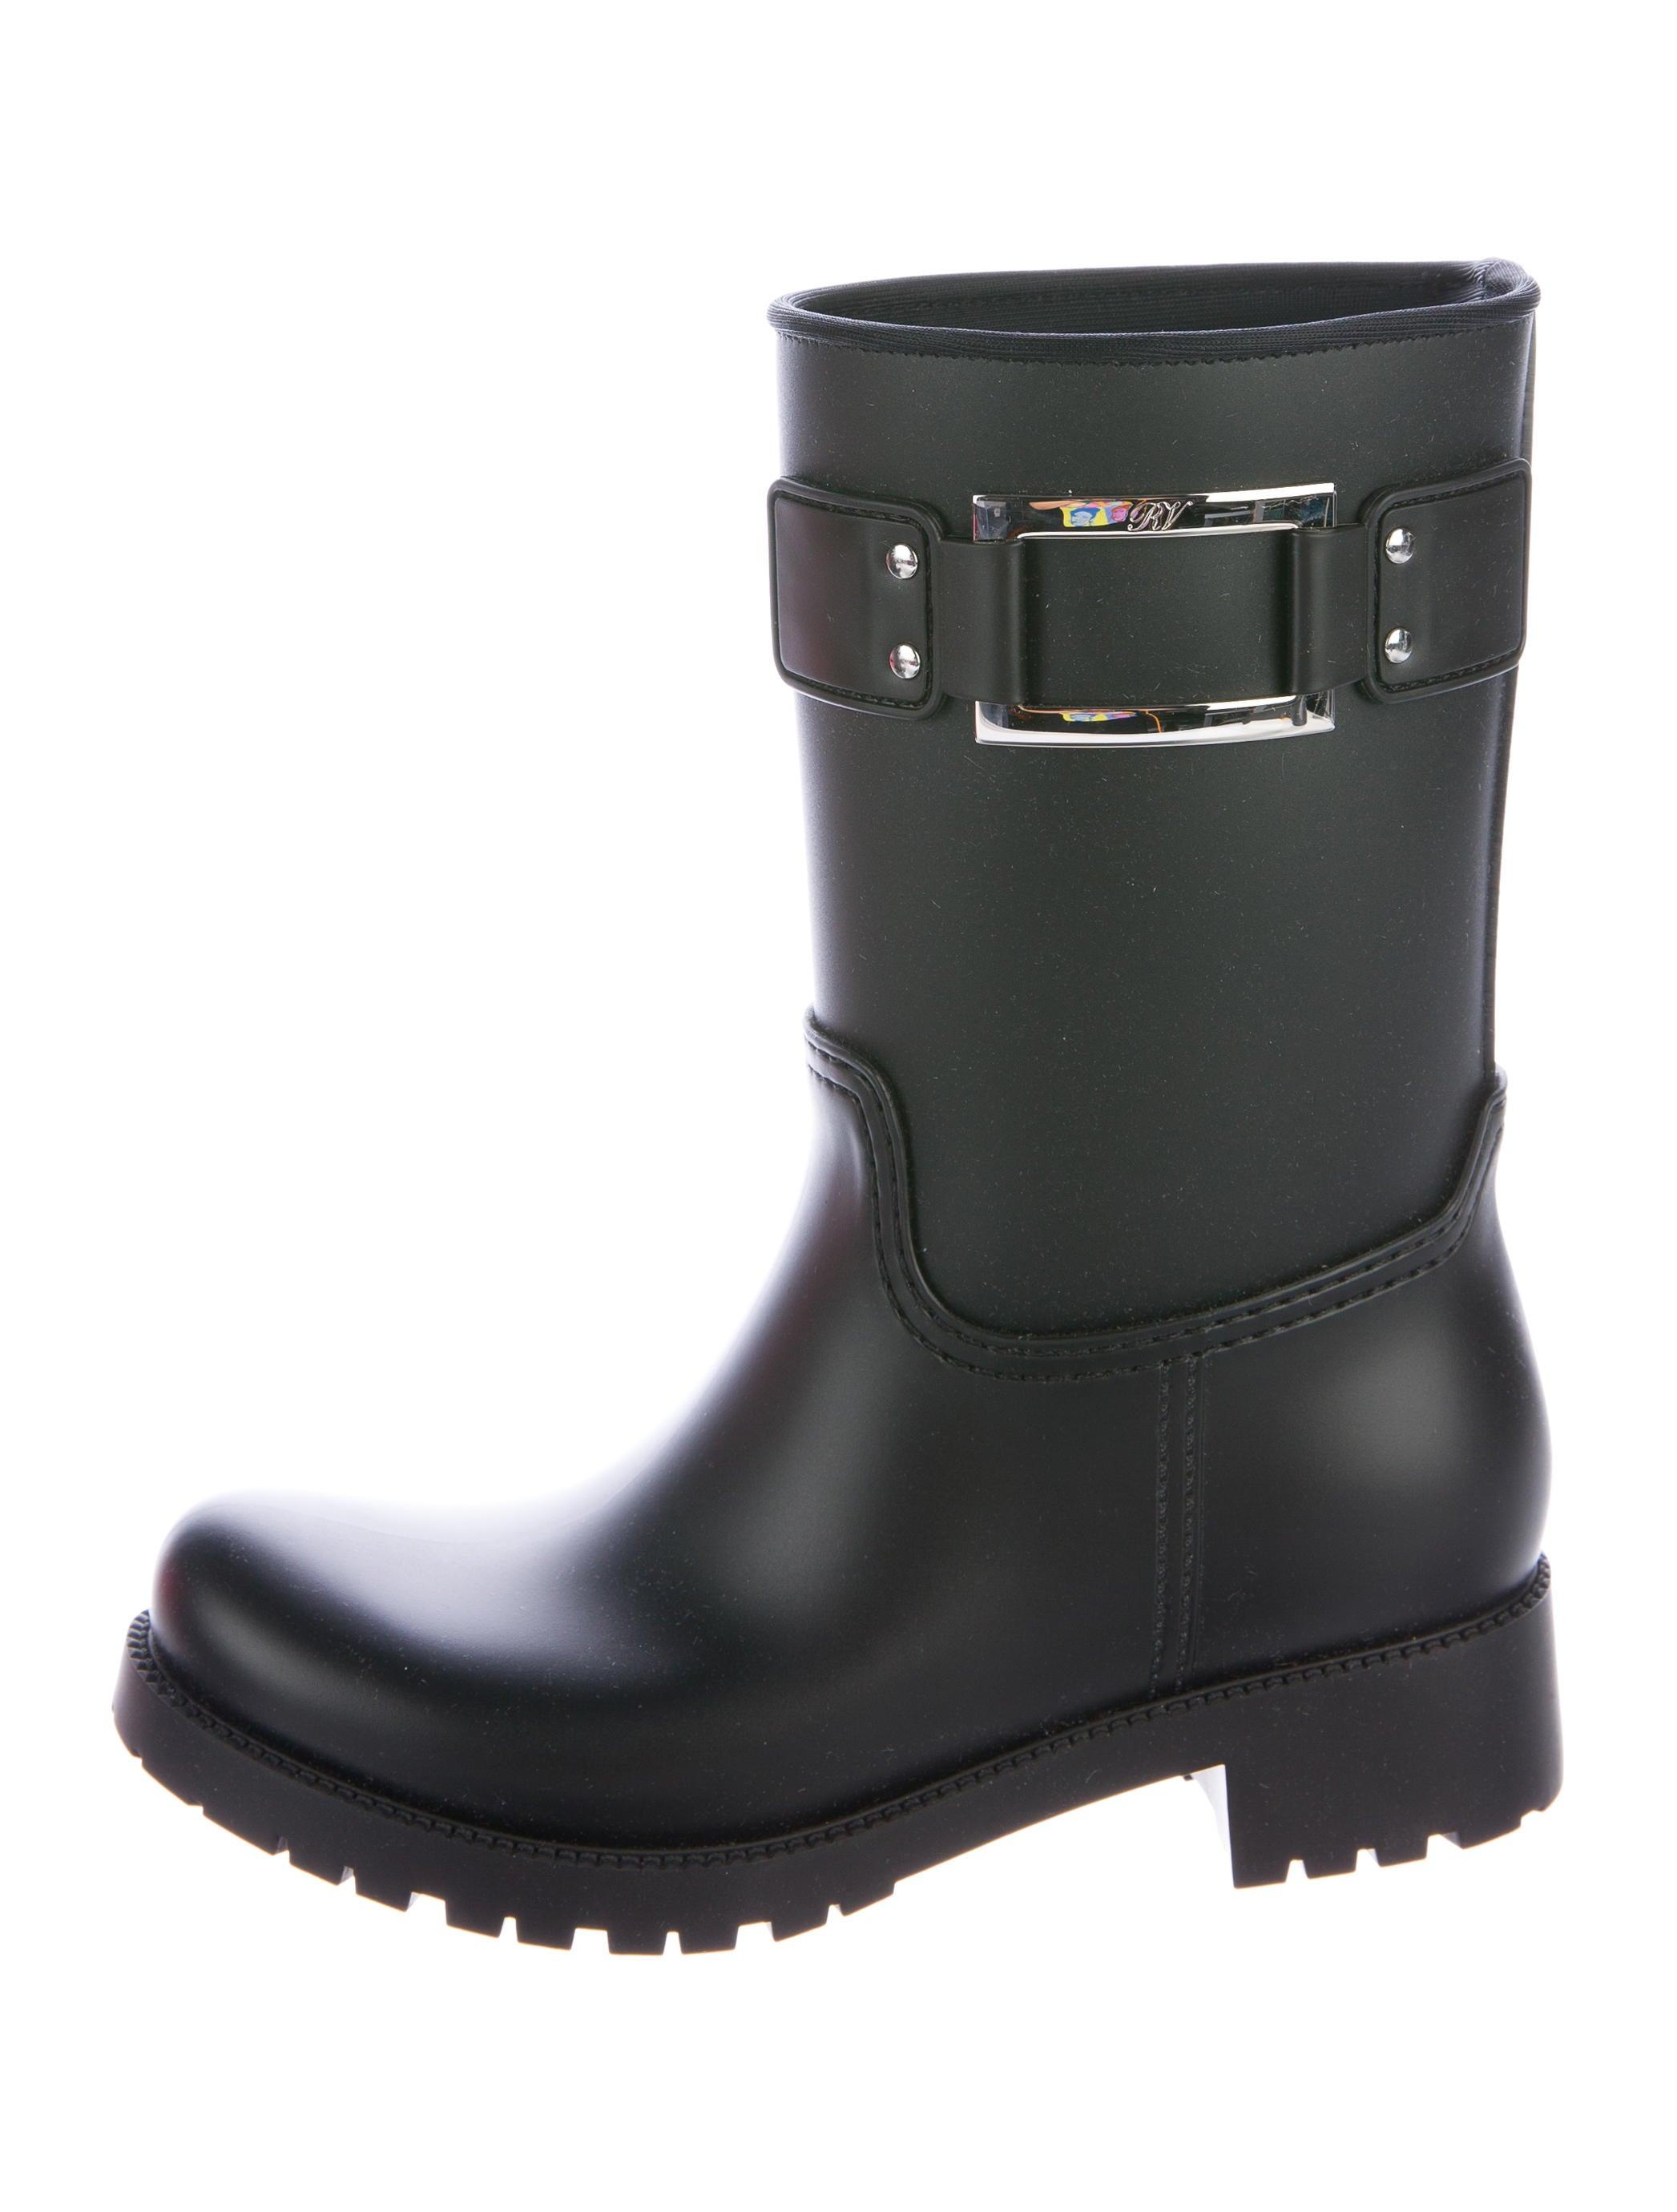 comfortable cheap online clearance footlocker Roger Vivier Rain Mid-Calf Boots IdeXD0v